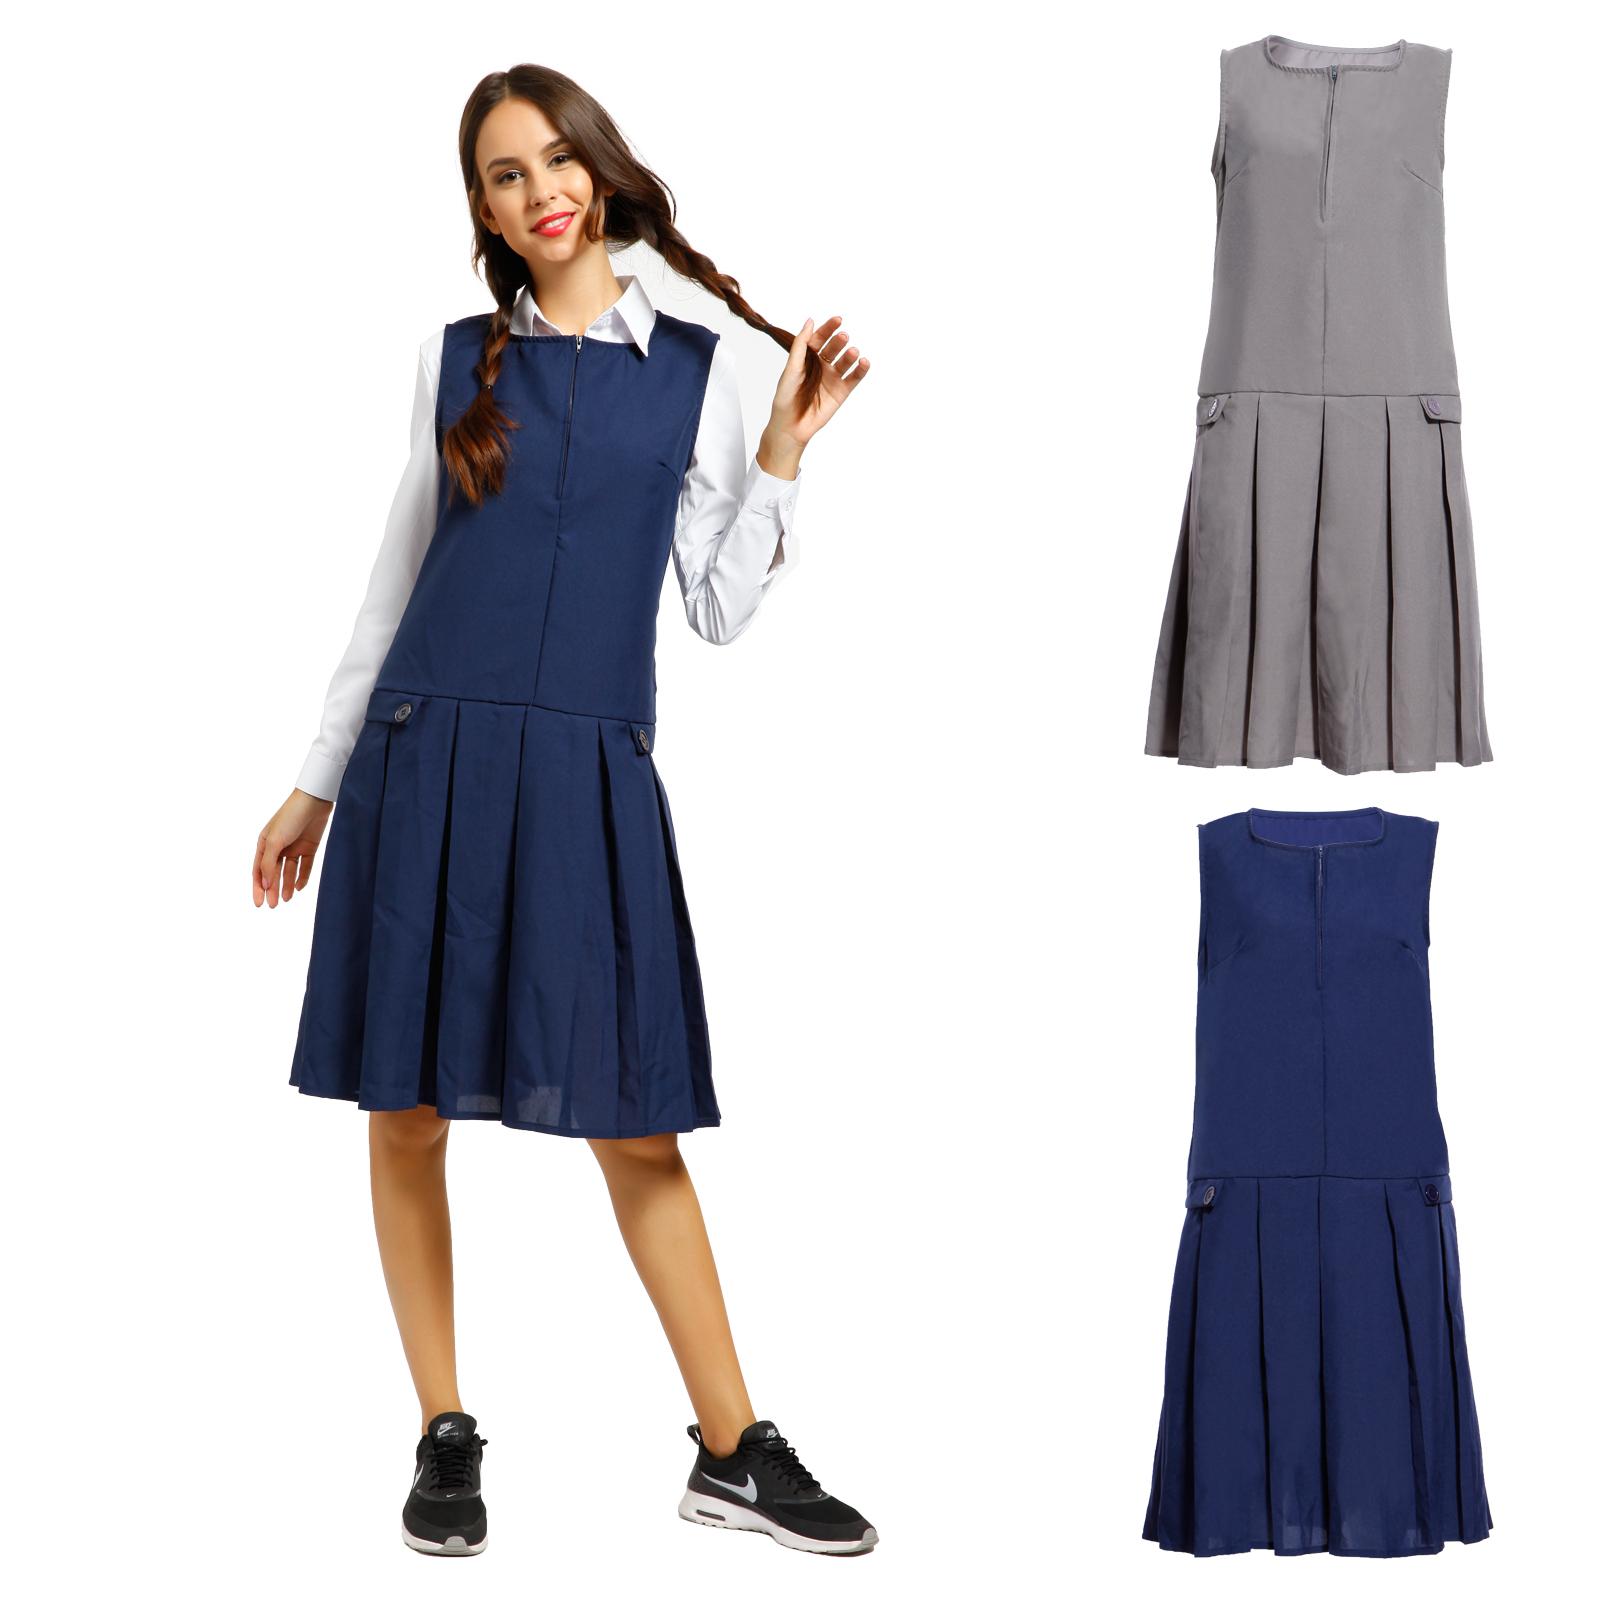 Dresses Uniform 13